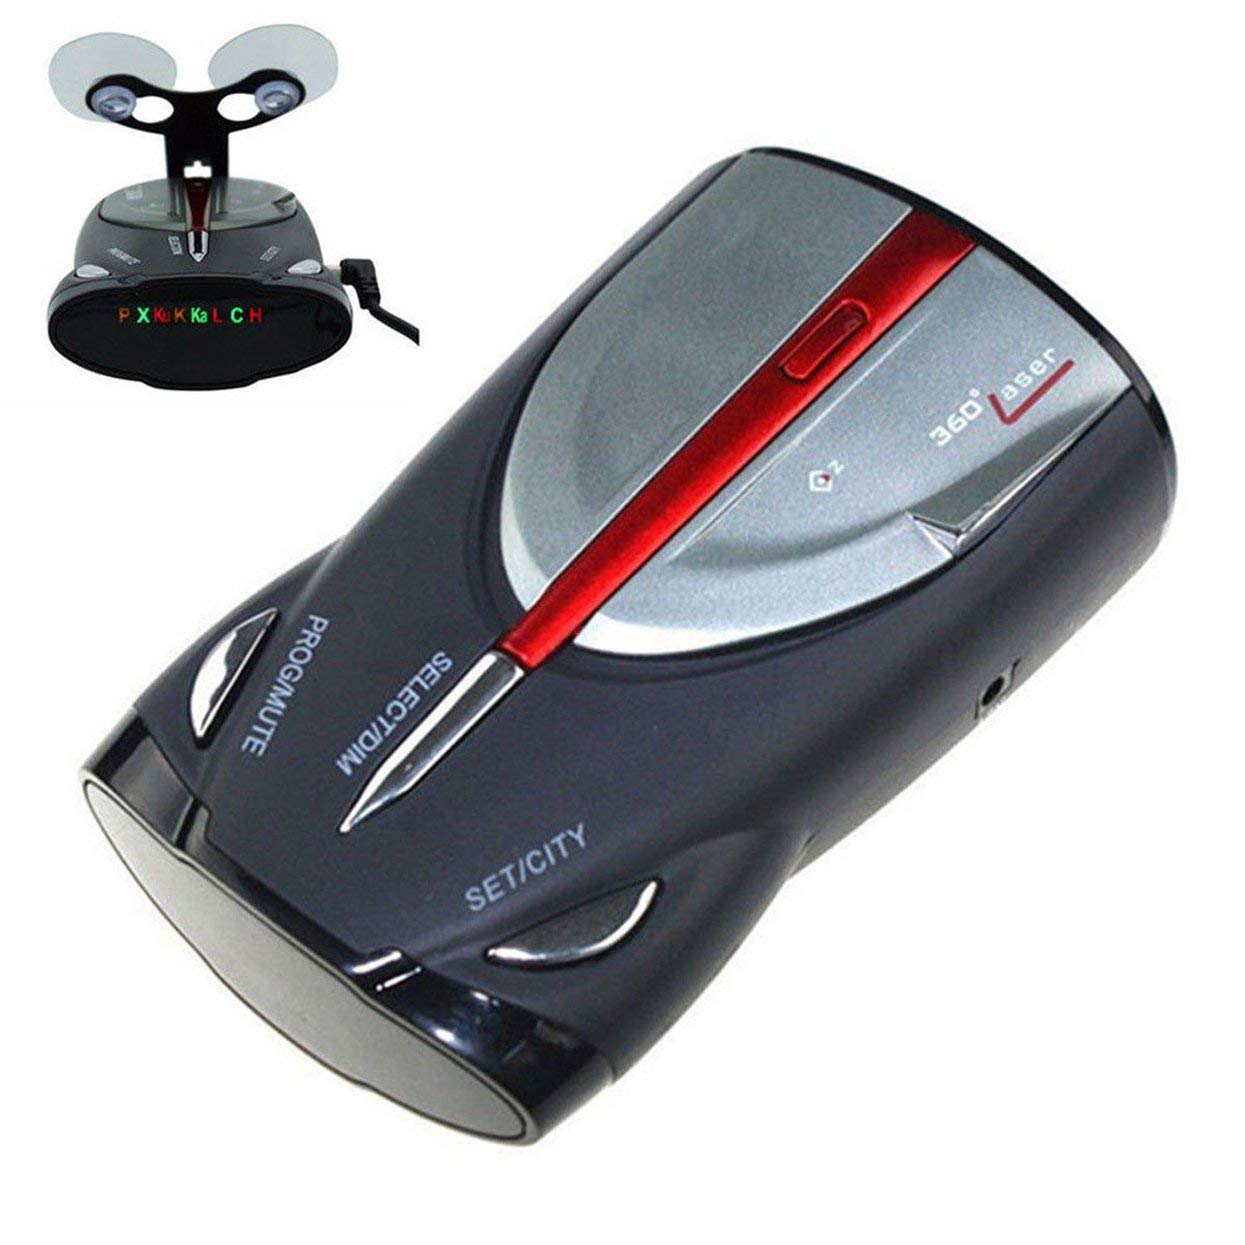 Tellaboull for 12V 16-Band 360 ° Velocidad del Coche GPS Luz Alerta de Voz Detector de Radar Cobra XRS 9880: Amazon.es: Hogar